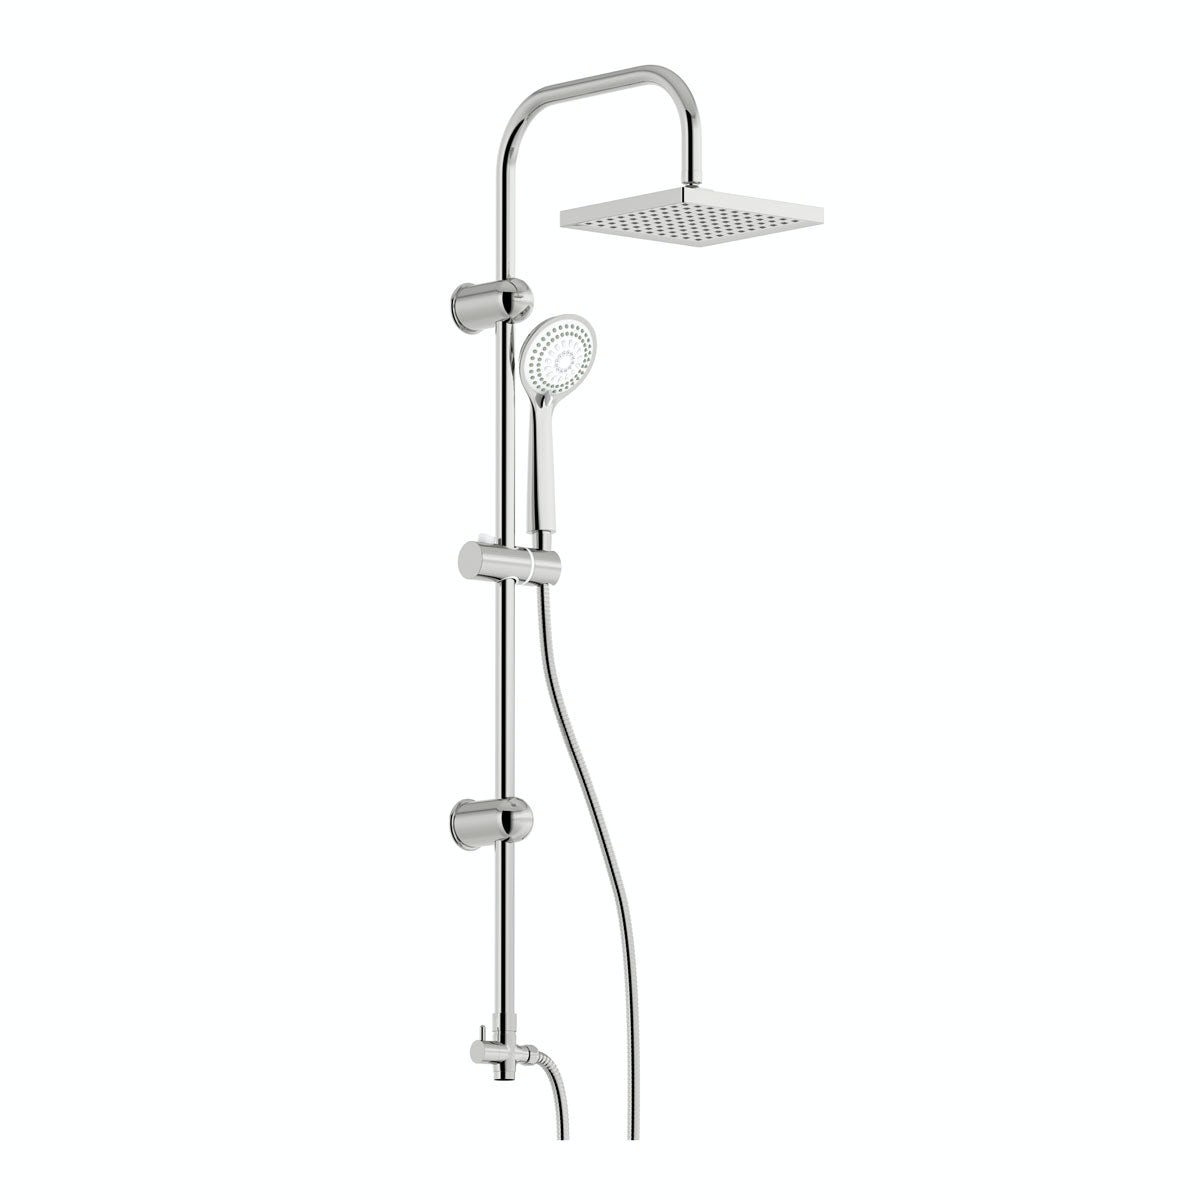 Clarity square head shower riser kit